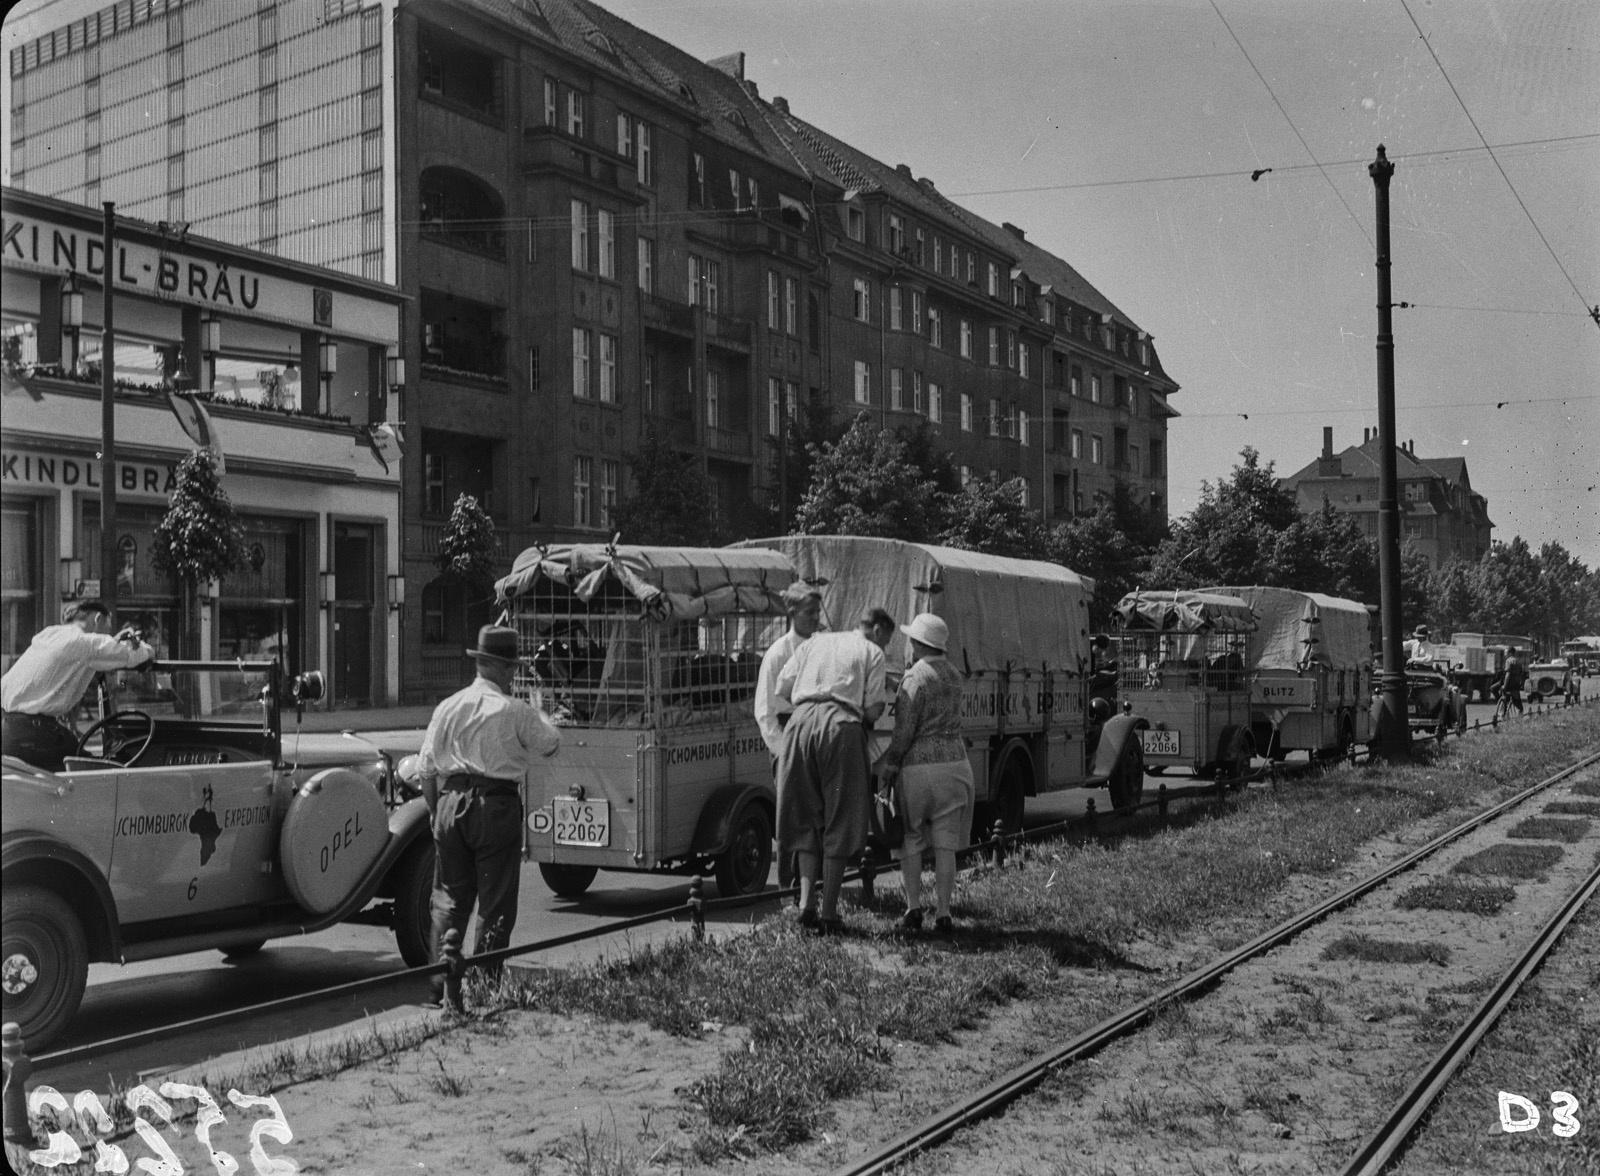 Берлин. Участники экспедиции во время остановки на Рейхсканцлерплатц